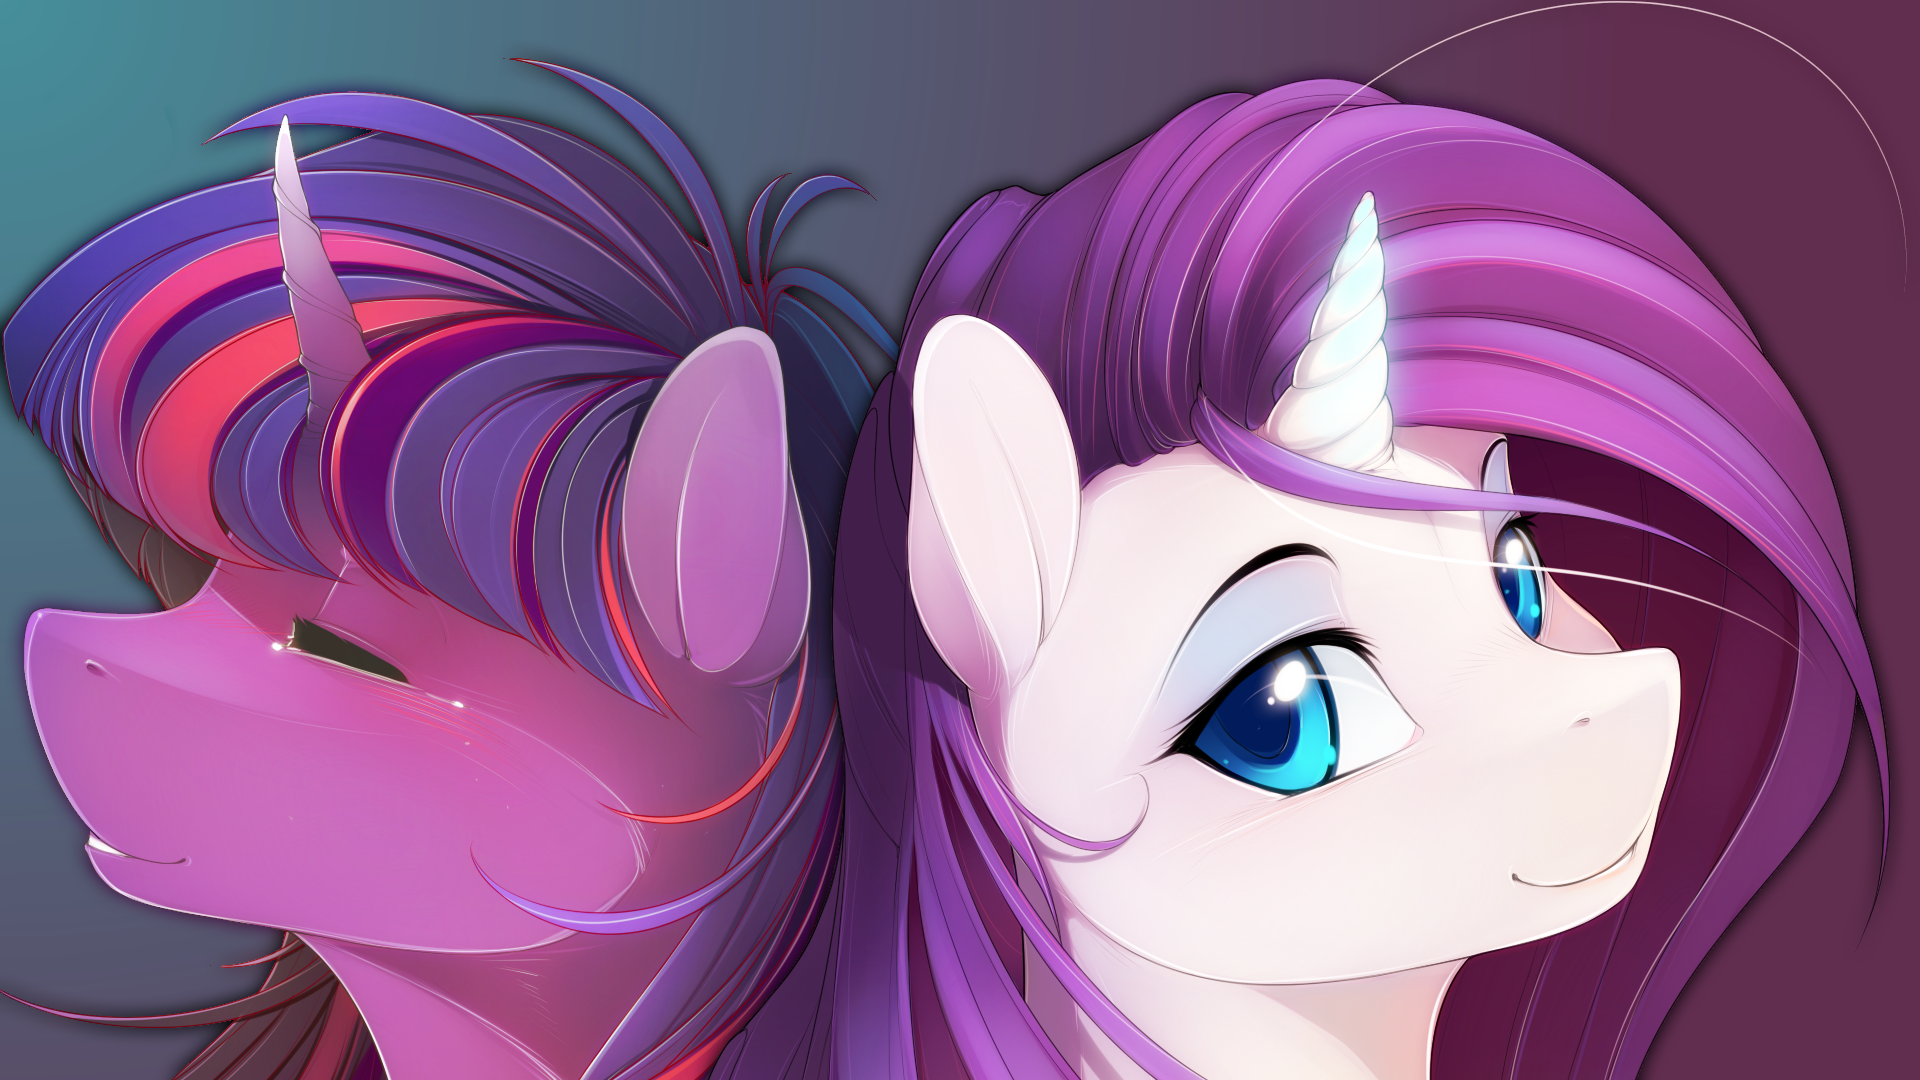 #334015 - artist:antiander, artist:shawnyall, lesbian, portrait, rarilight, rarity, safe, shipping, twilight sparkle, wallpaper - Derpibooru - My Little Pony: Friendship is Magic Imageboard